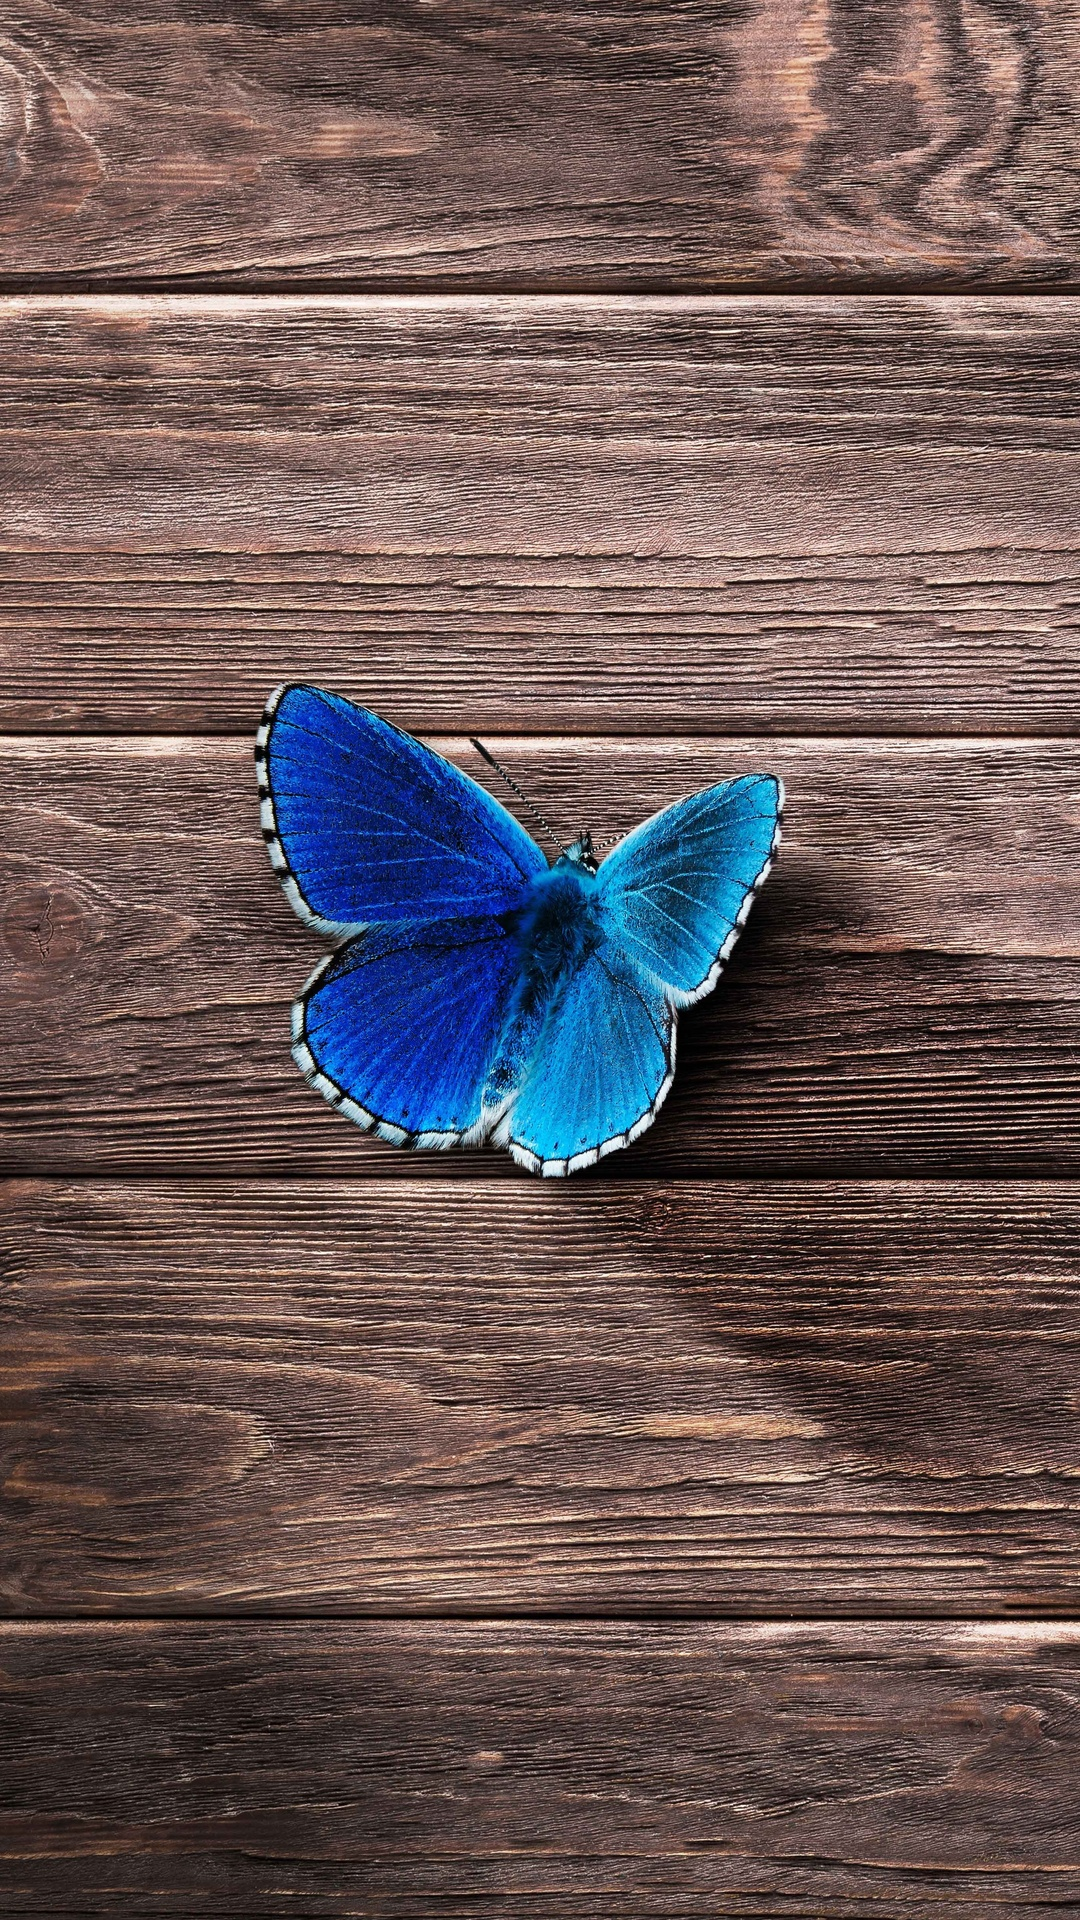 8k Animal Wallpaper Download: 1080x1920 Butterfly 8k Iphone 7,6s,6 Plus, Pixel Xl ,One